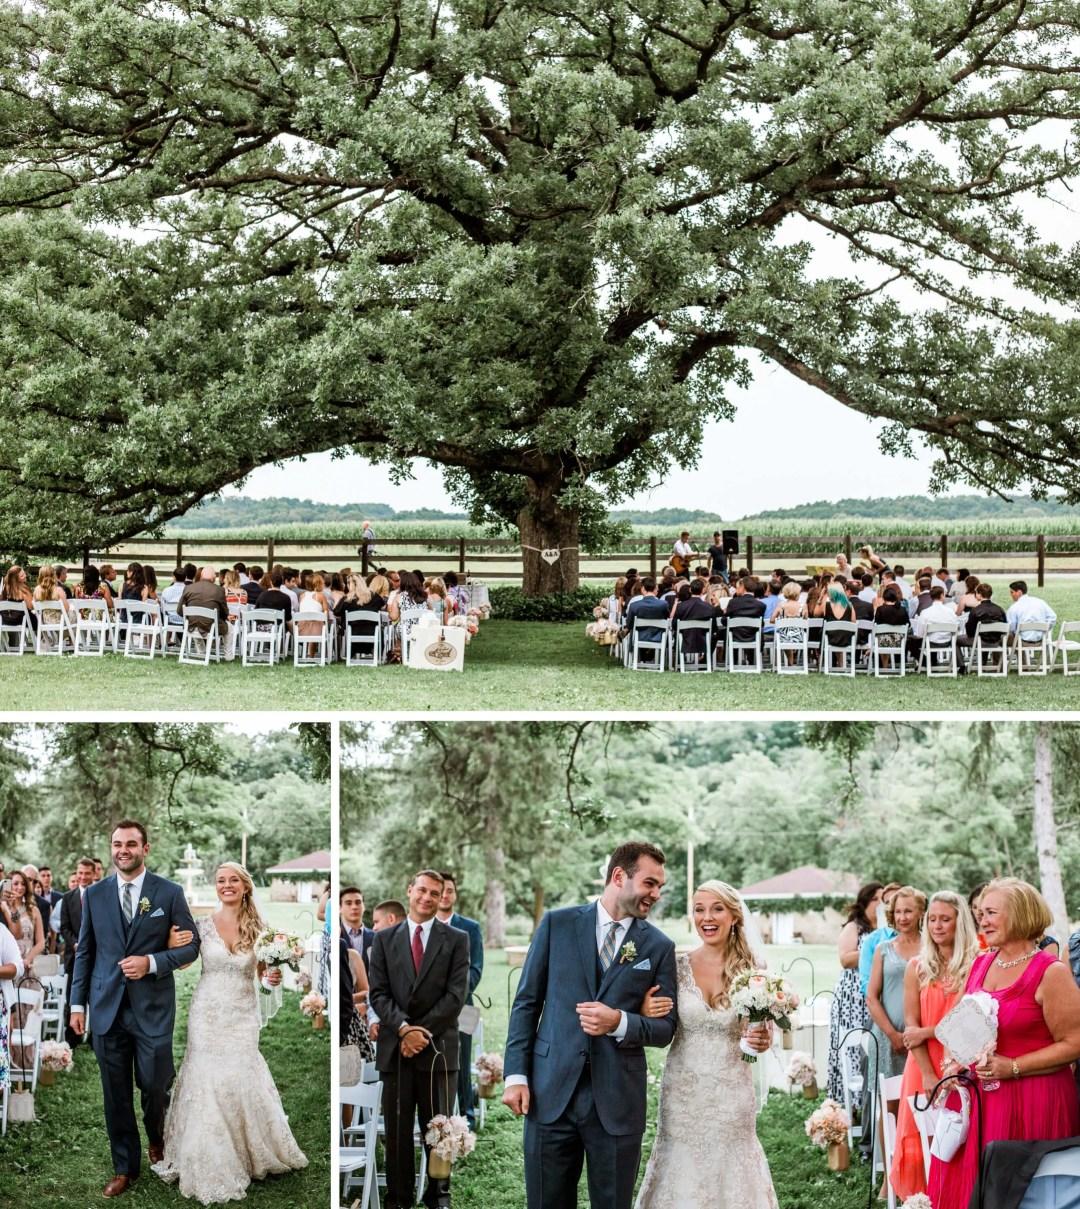 Ceremony under big oak tree - sussex wedding photographer